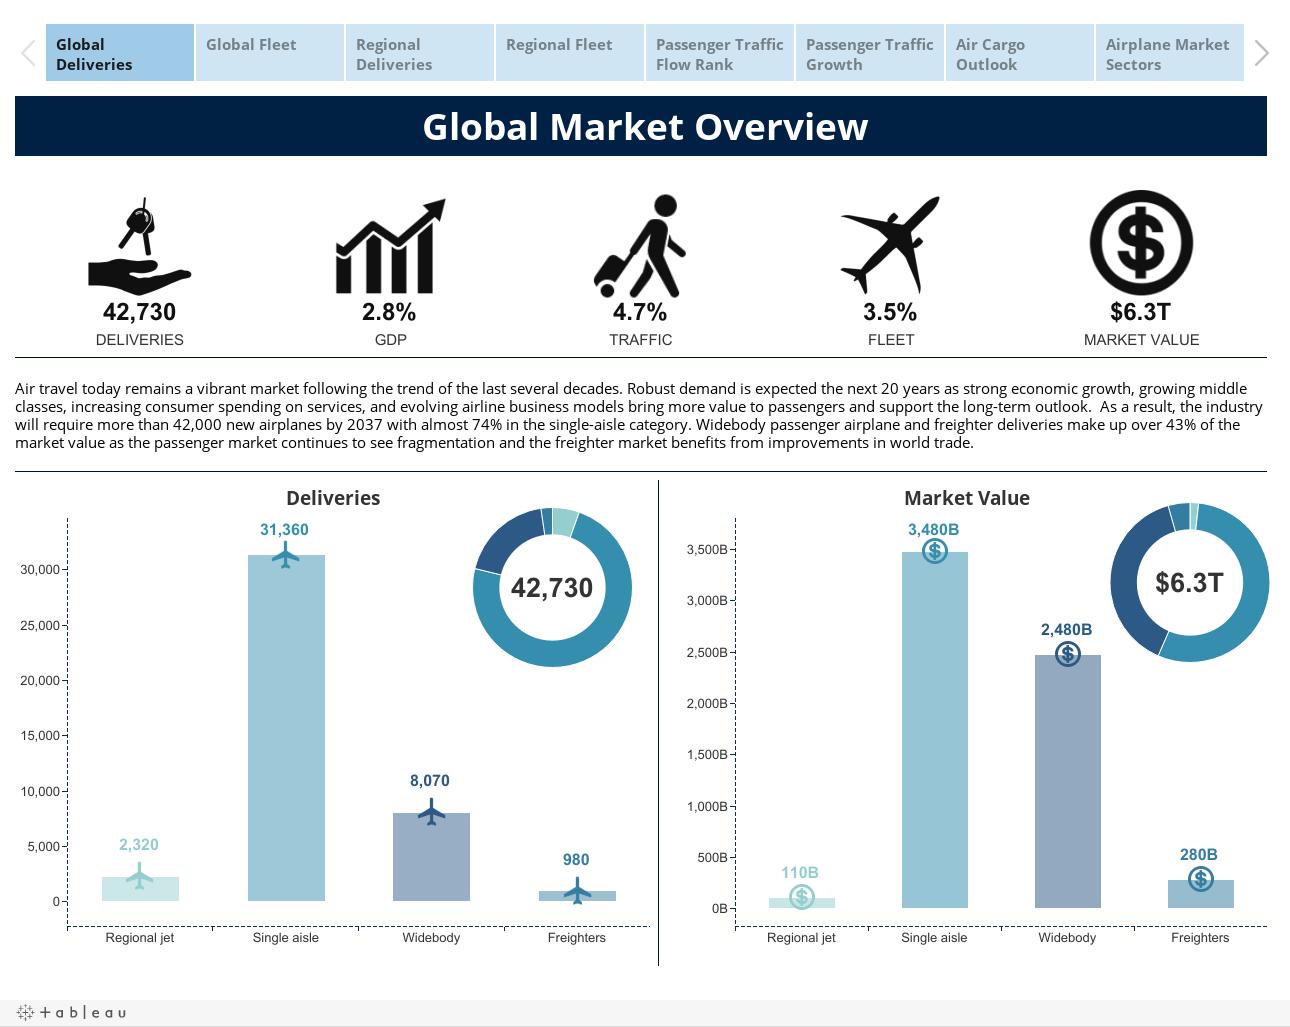 Commercial Market Outlook